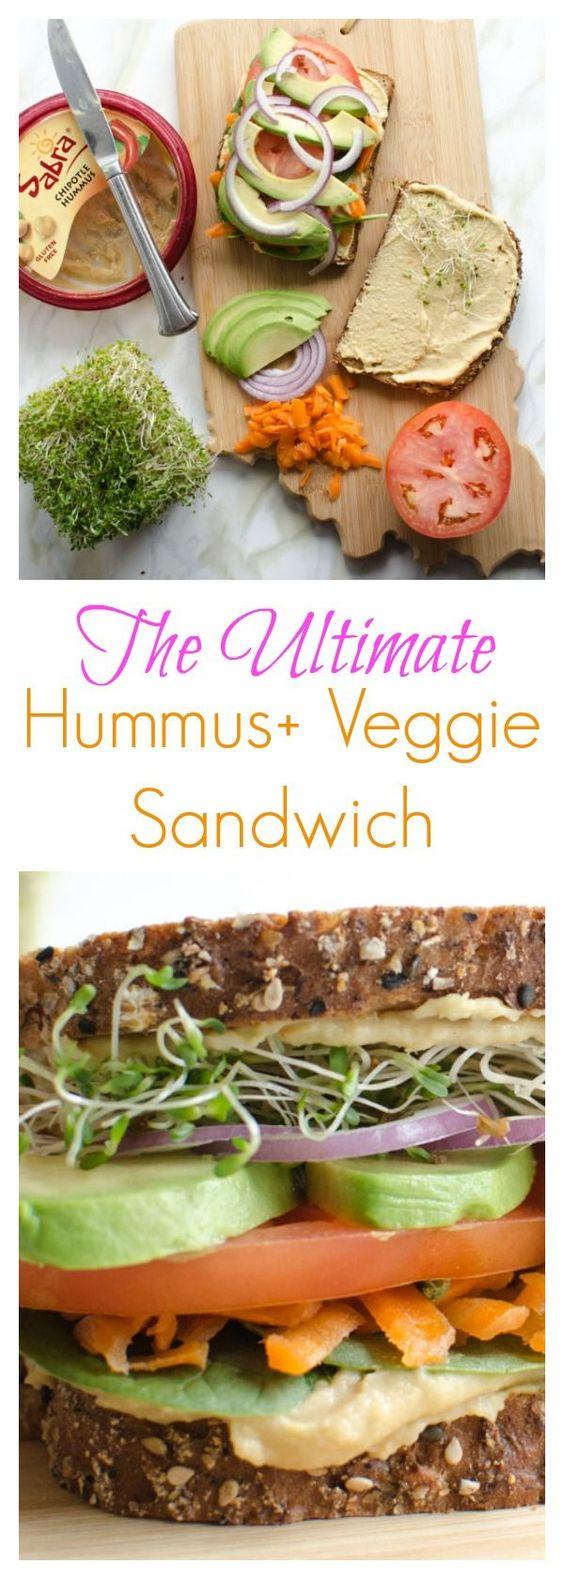 The Ultimate Hummus and Veggie Sandwich #hummus #veggies #veggiesandwich #sandwich #vegetarian #vegetarianrecipes